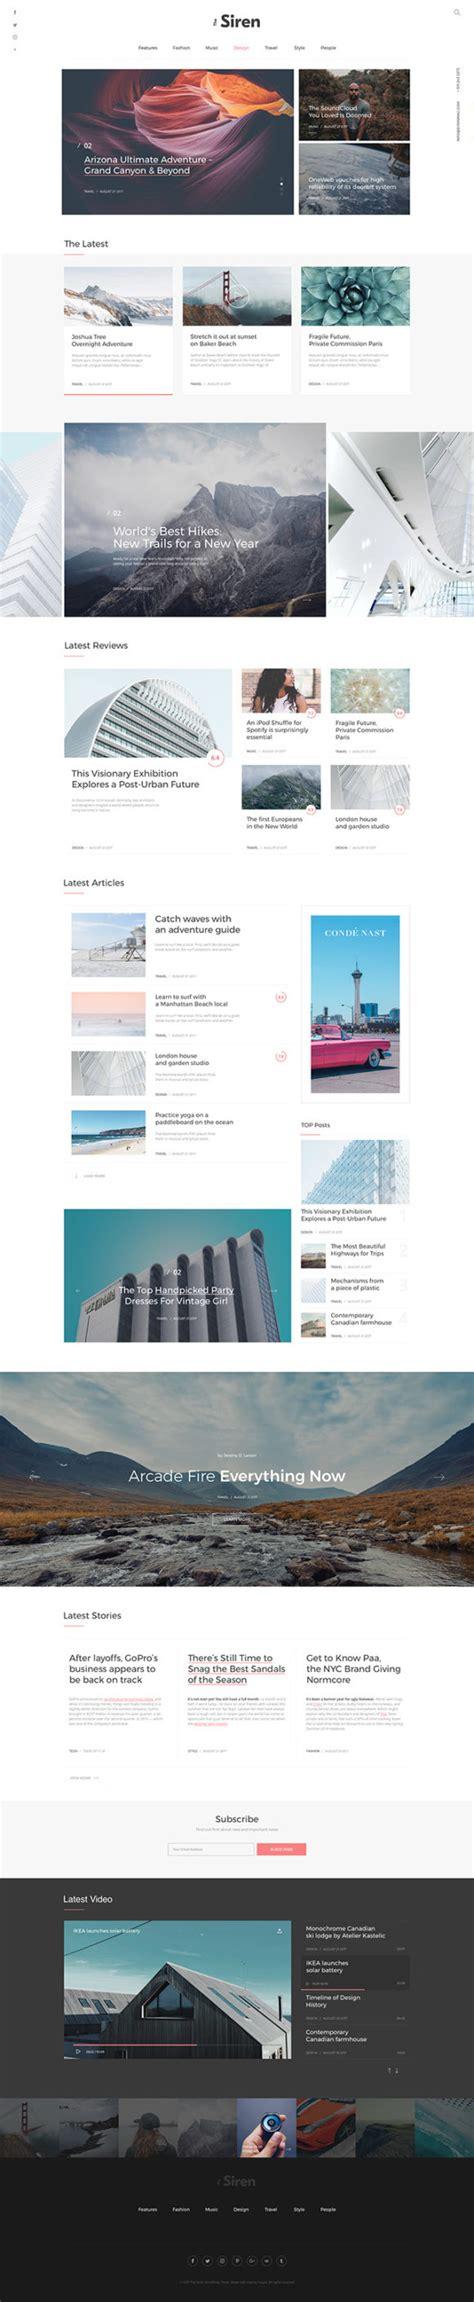 design concept magazine malaysia the siren one page blog magazine design concept idevie